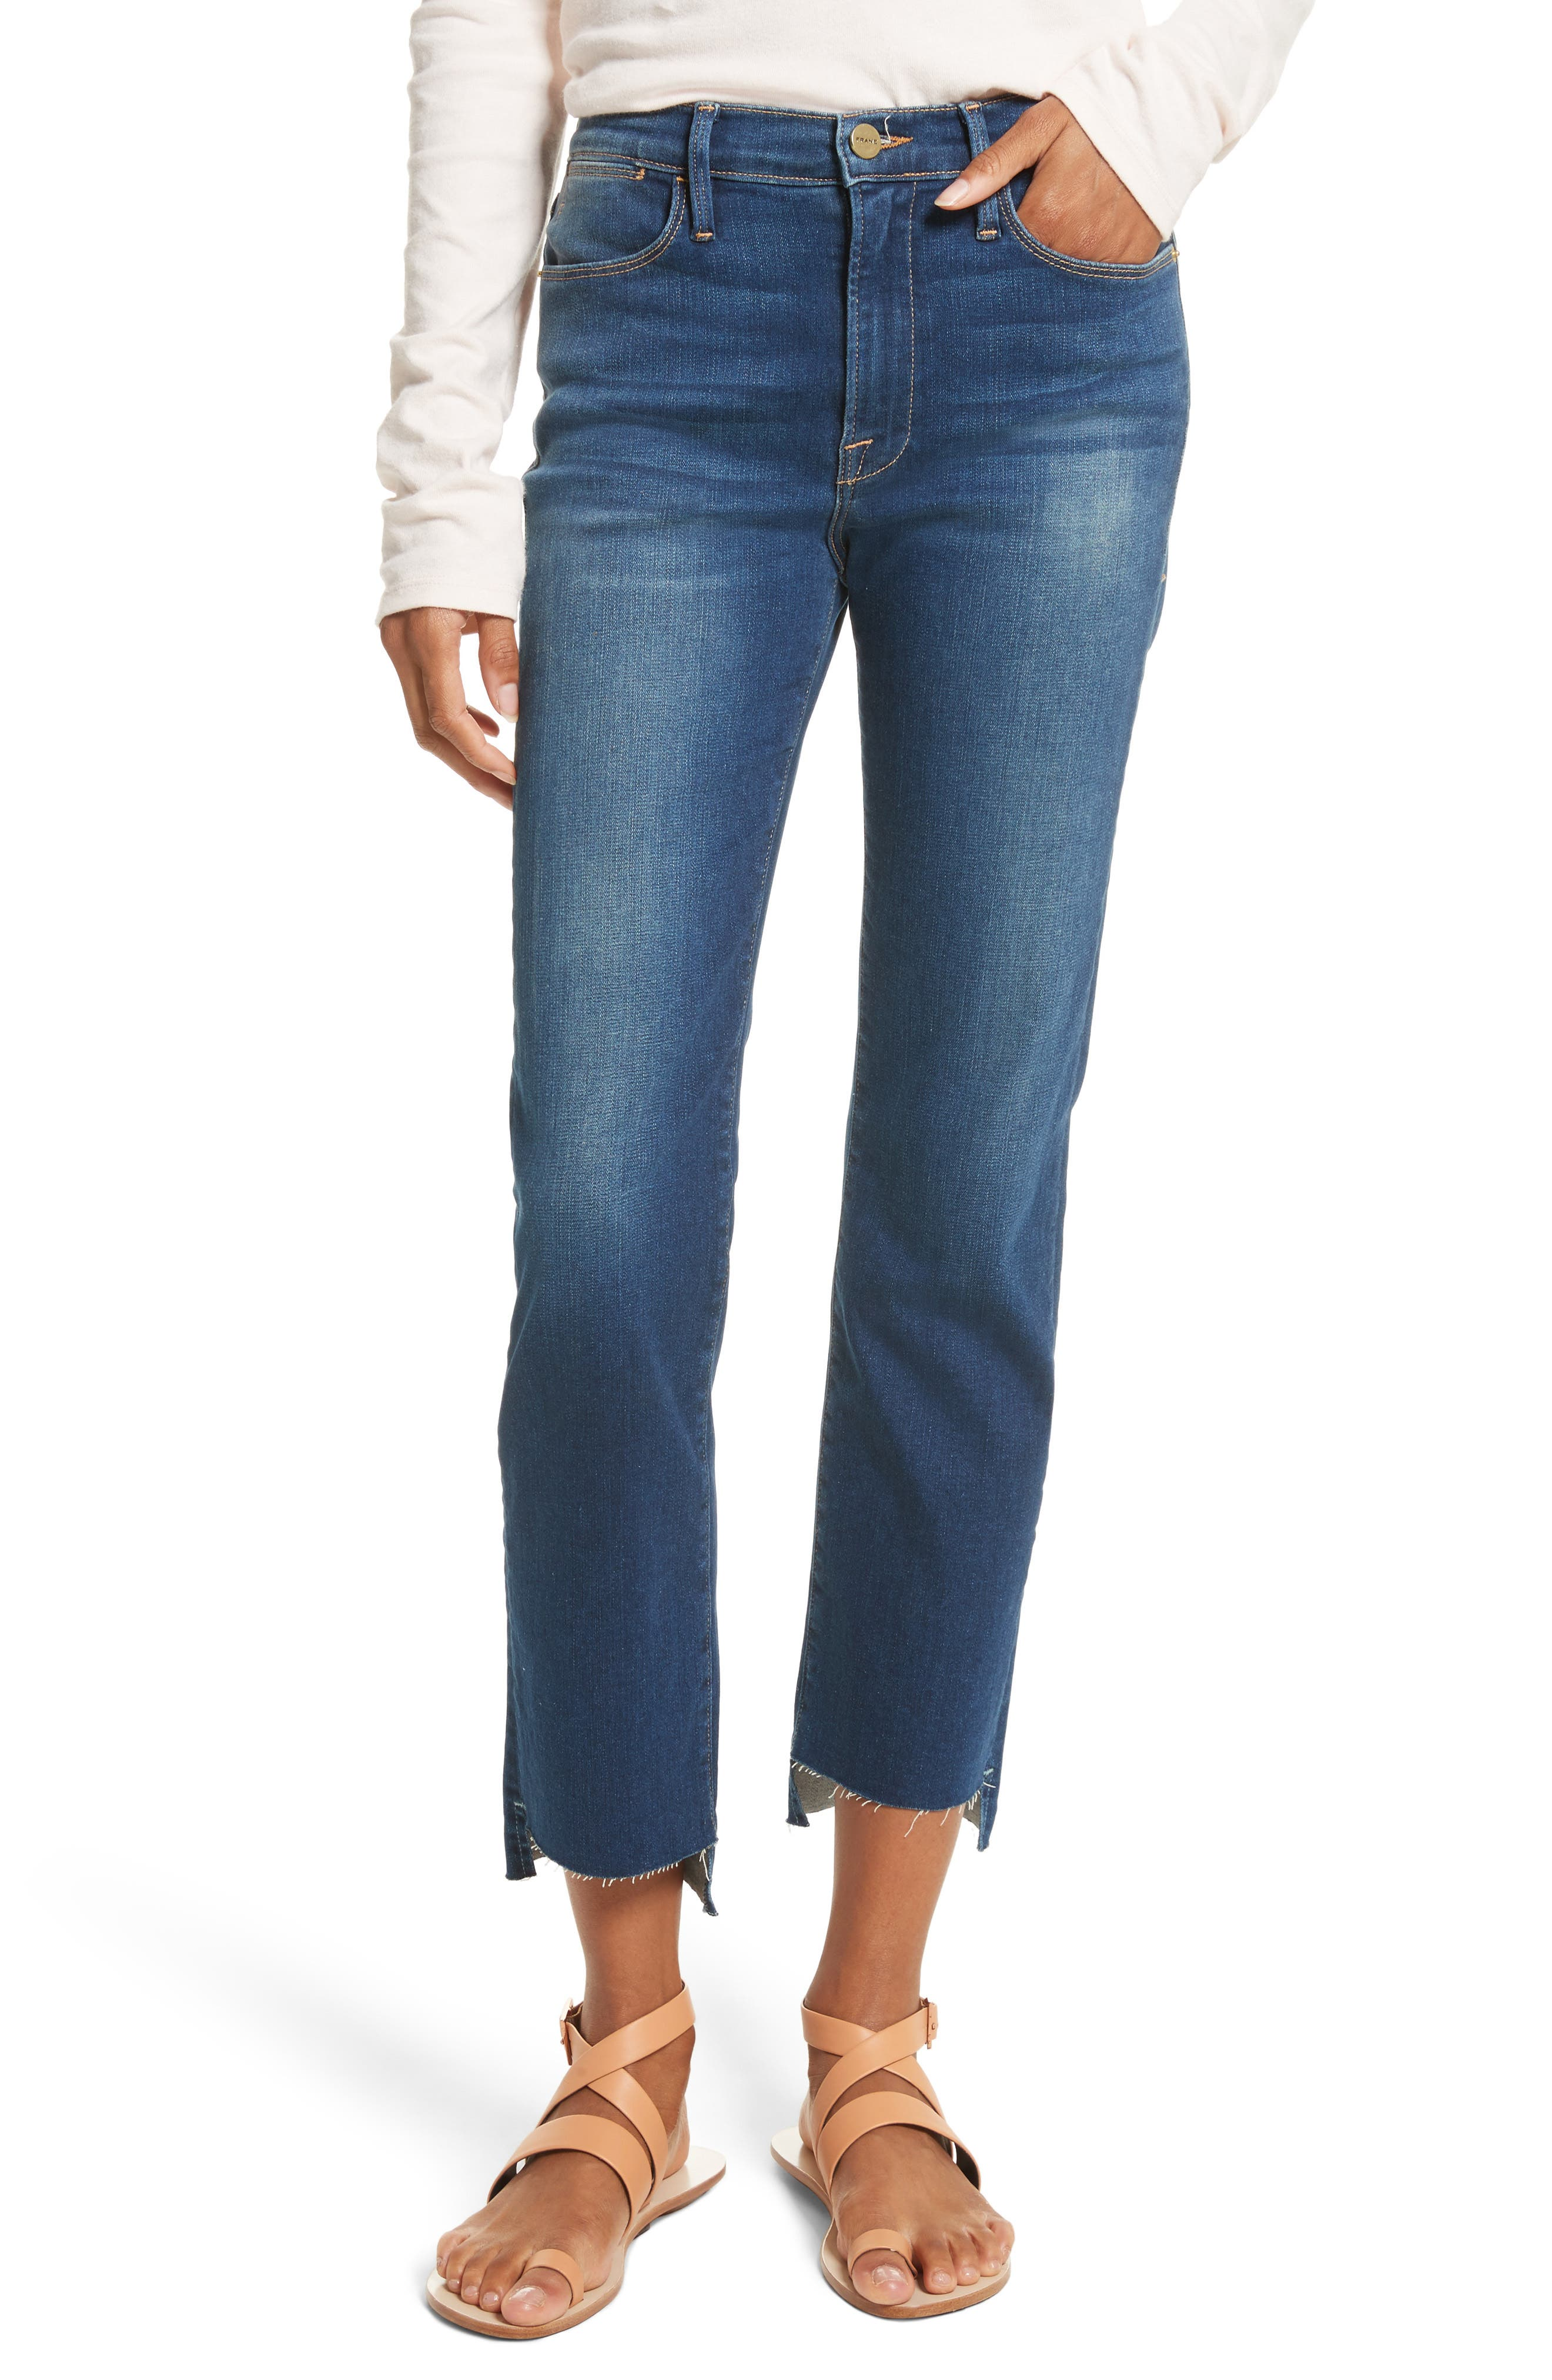 Le High Straight High Waist Raw Stagger Jeans,                         Main,                         color, Murrayfield